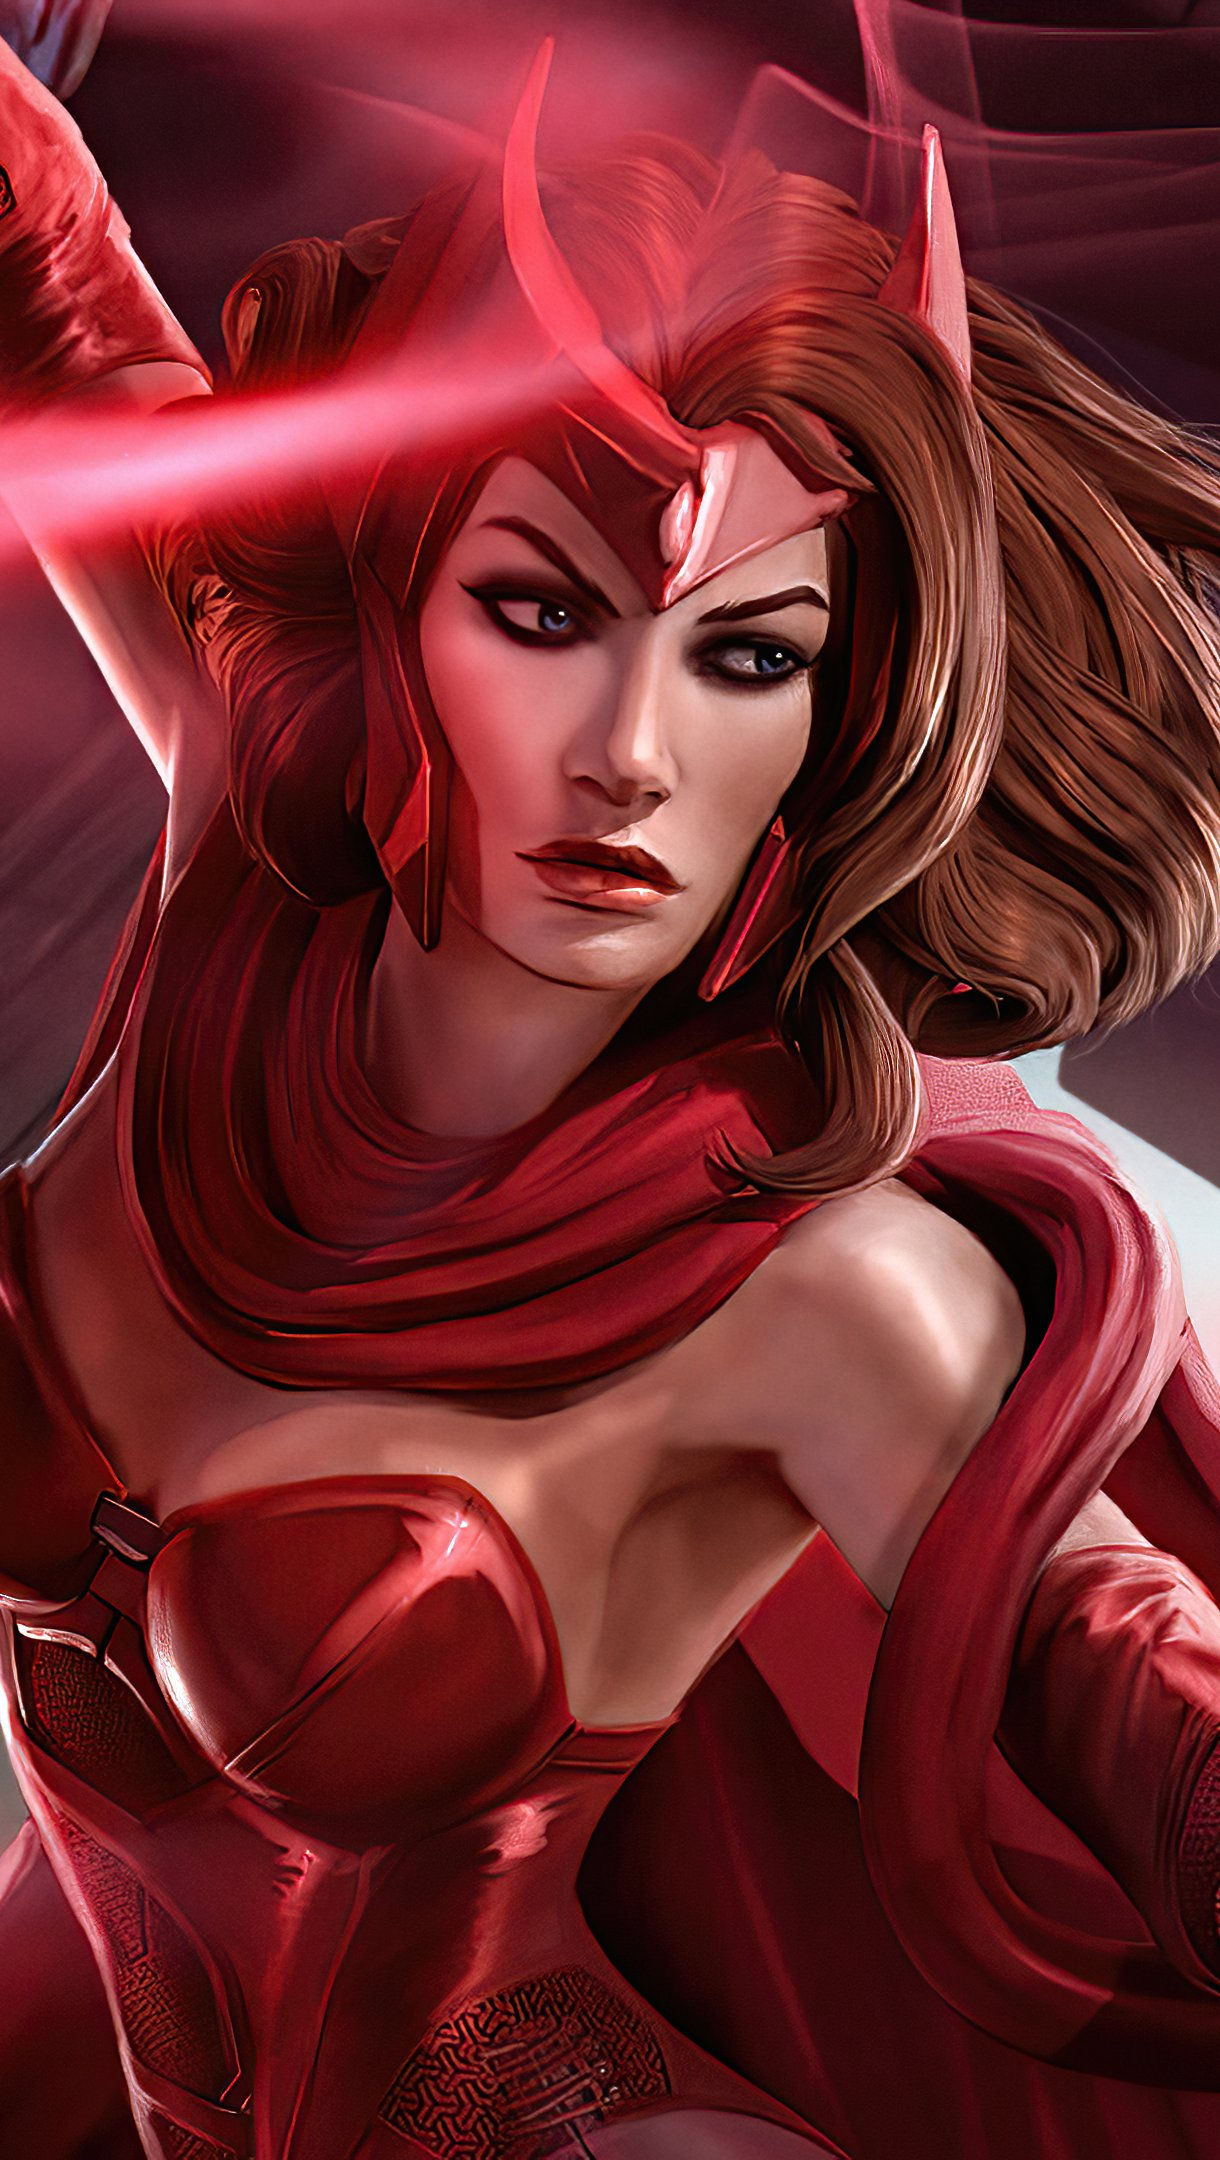 Wallpaper Scarlet Witch Art Print 2021 Vertical